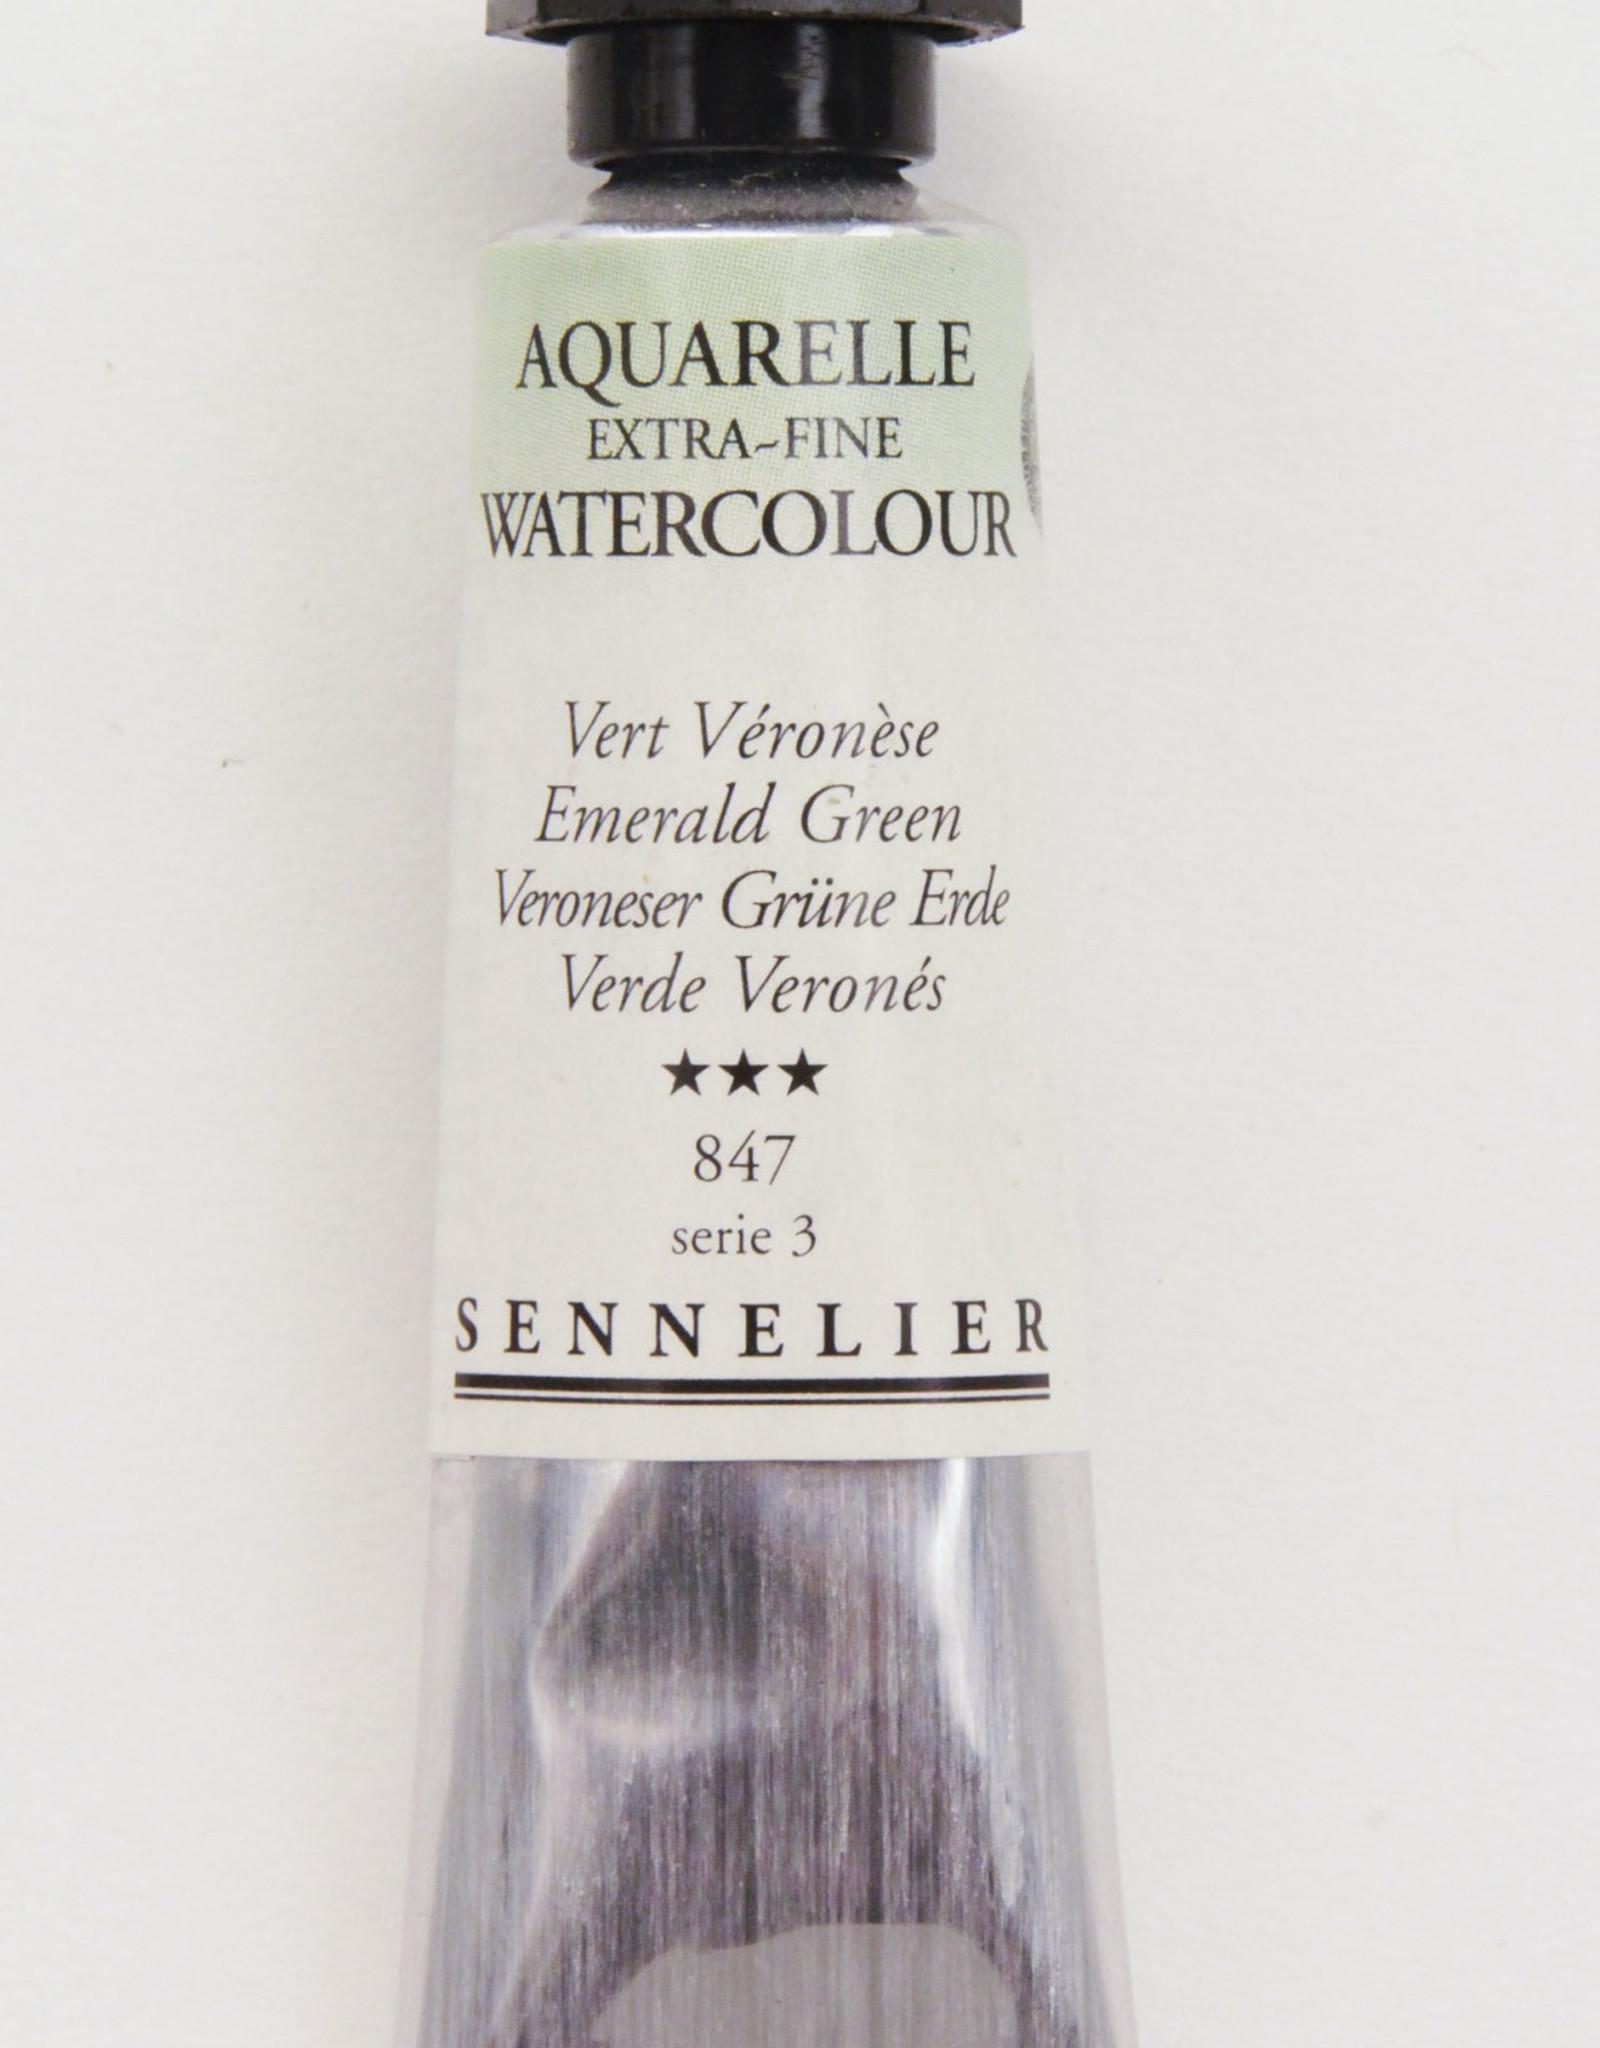 Sennelier, Aquarelle Watercolor Paint, Emerald Green, 847, 10ml Tube, Series 3